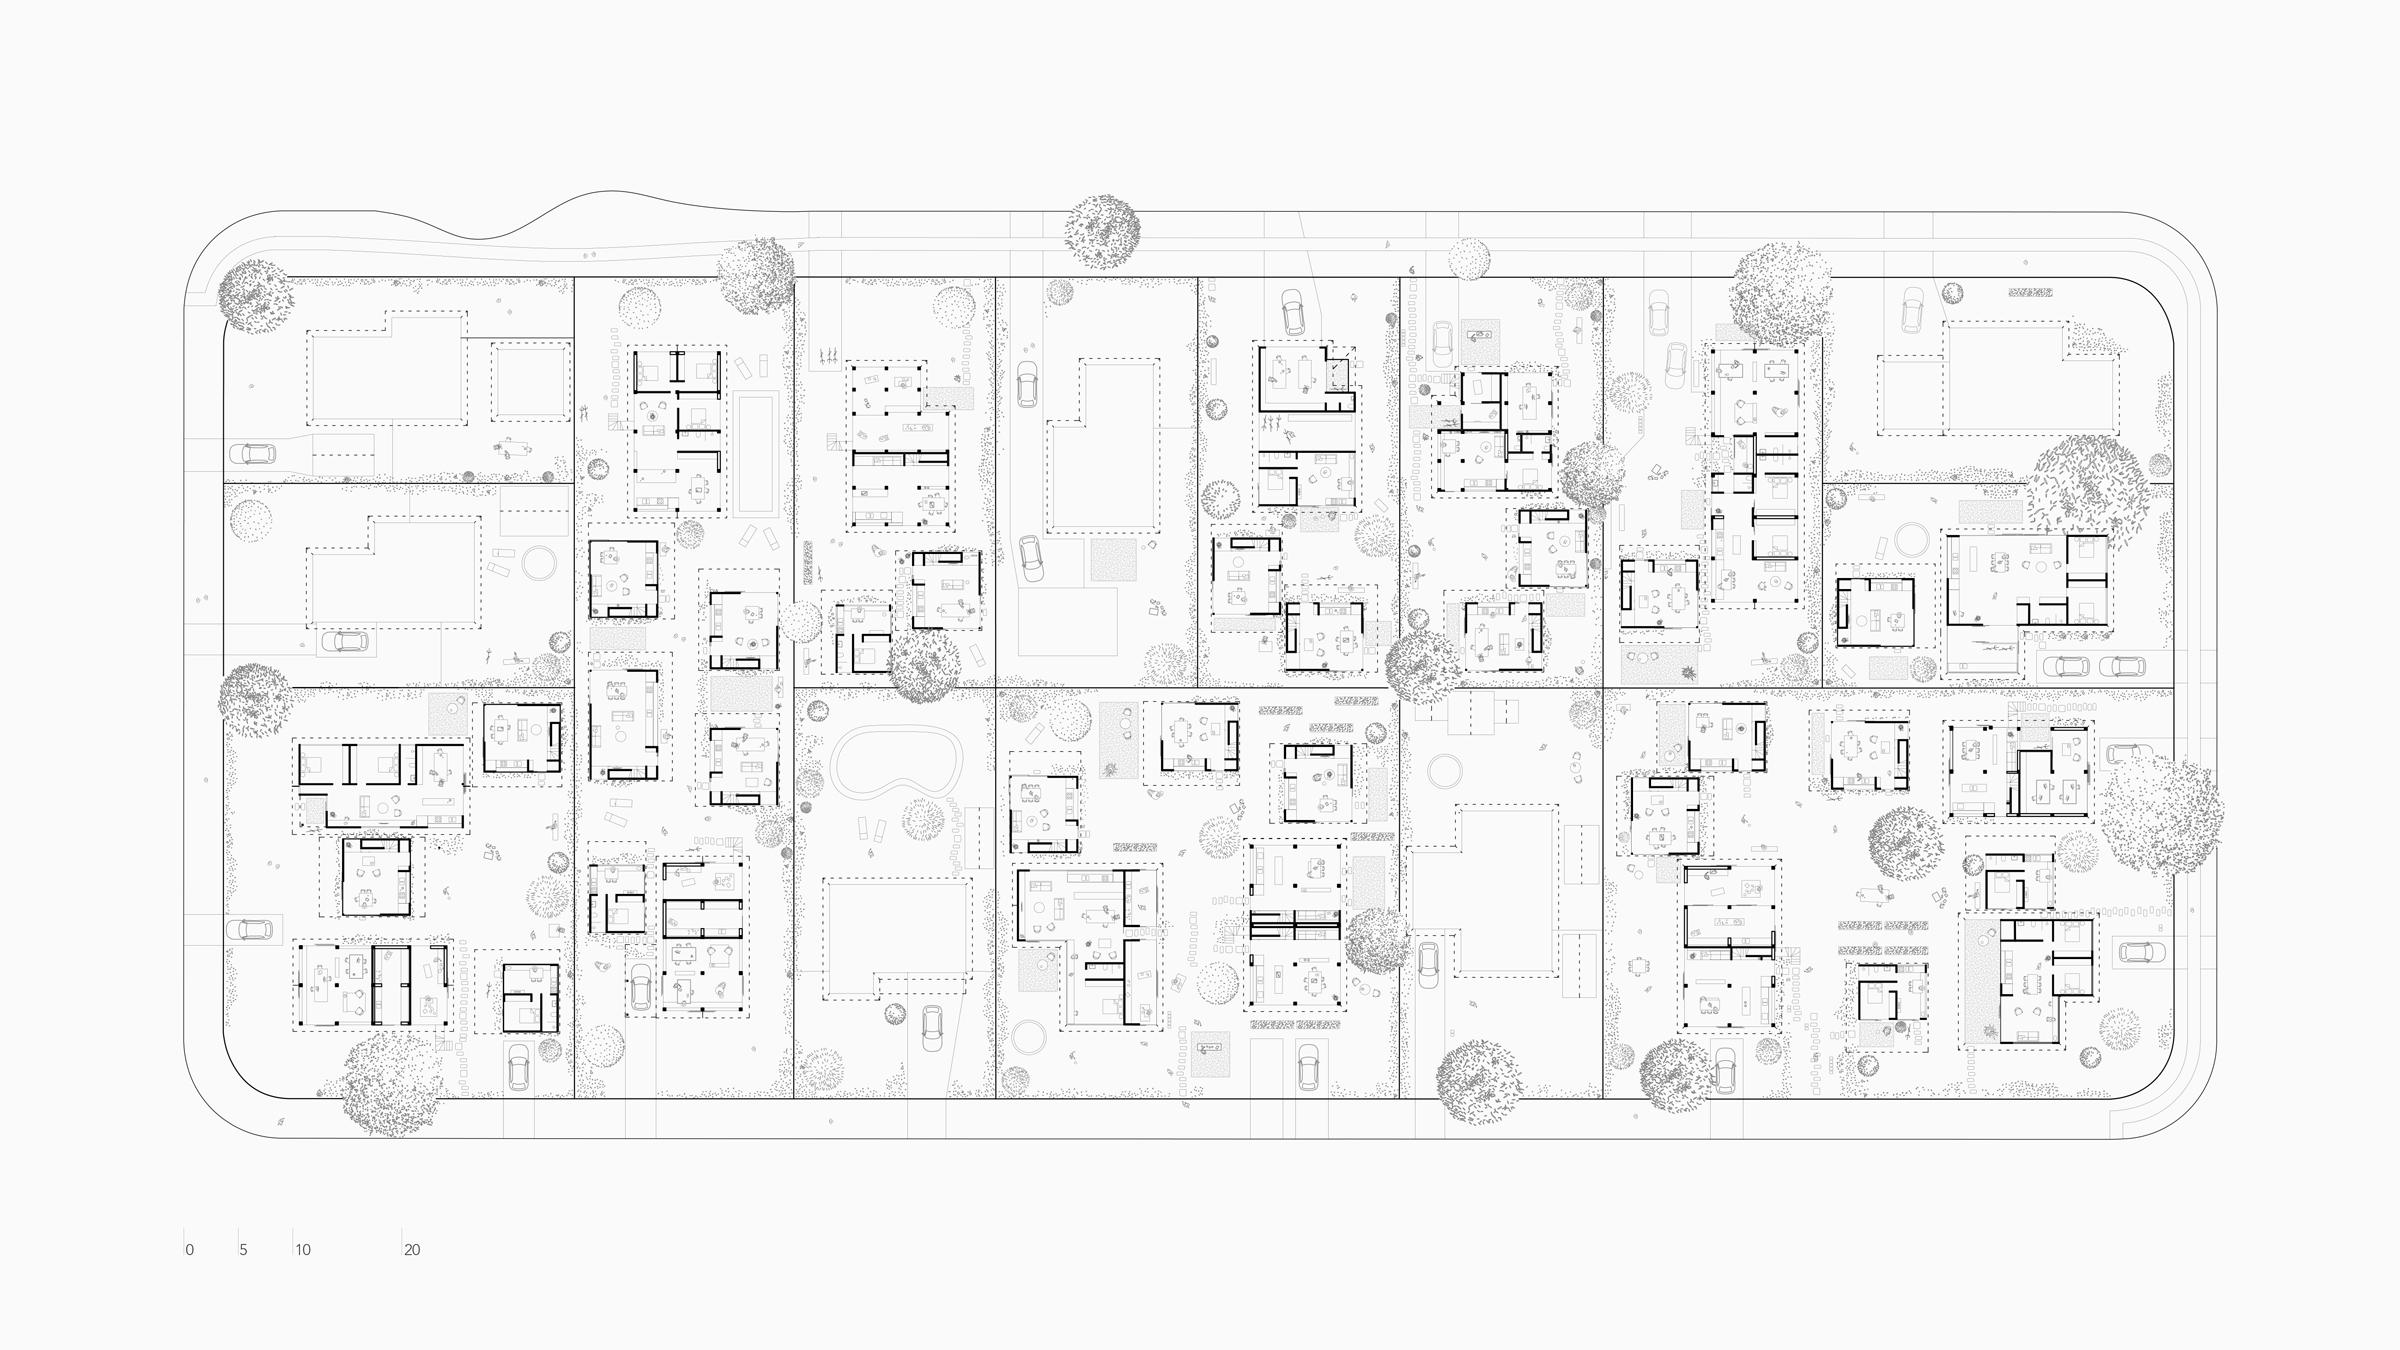 171212-Dappled-Dwellings-Site-Plan-Full.jpg